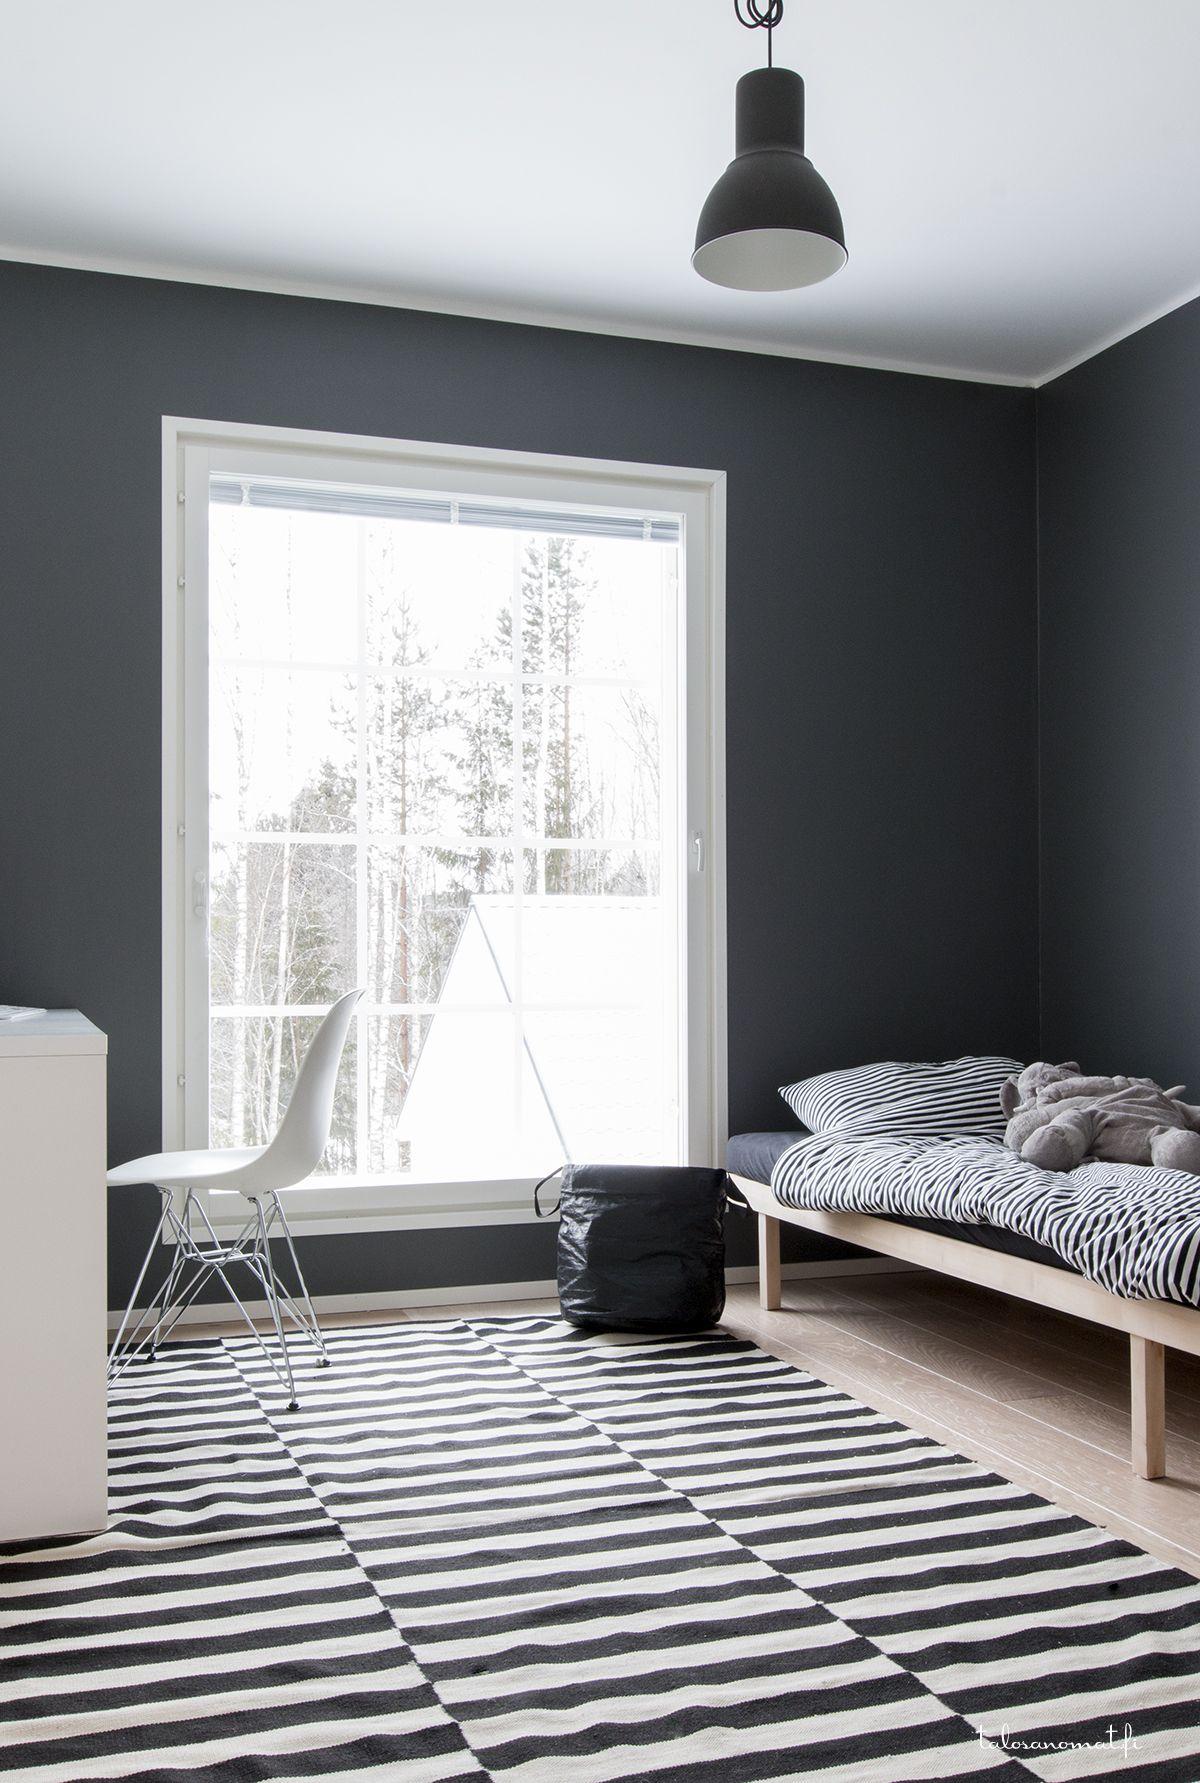 basaltti seinmaali tikkurila  New Home New Ideas